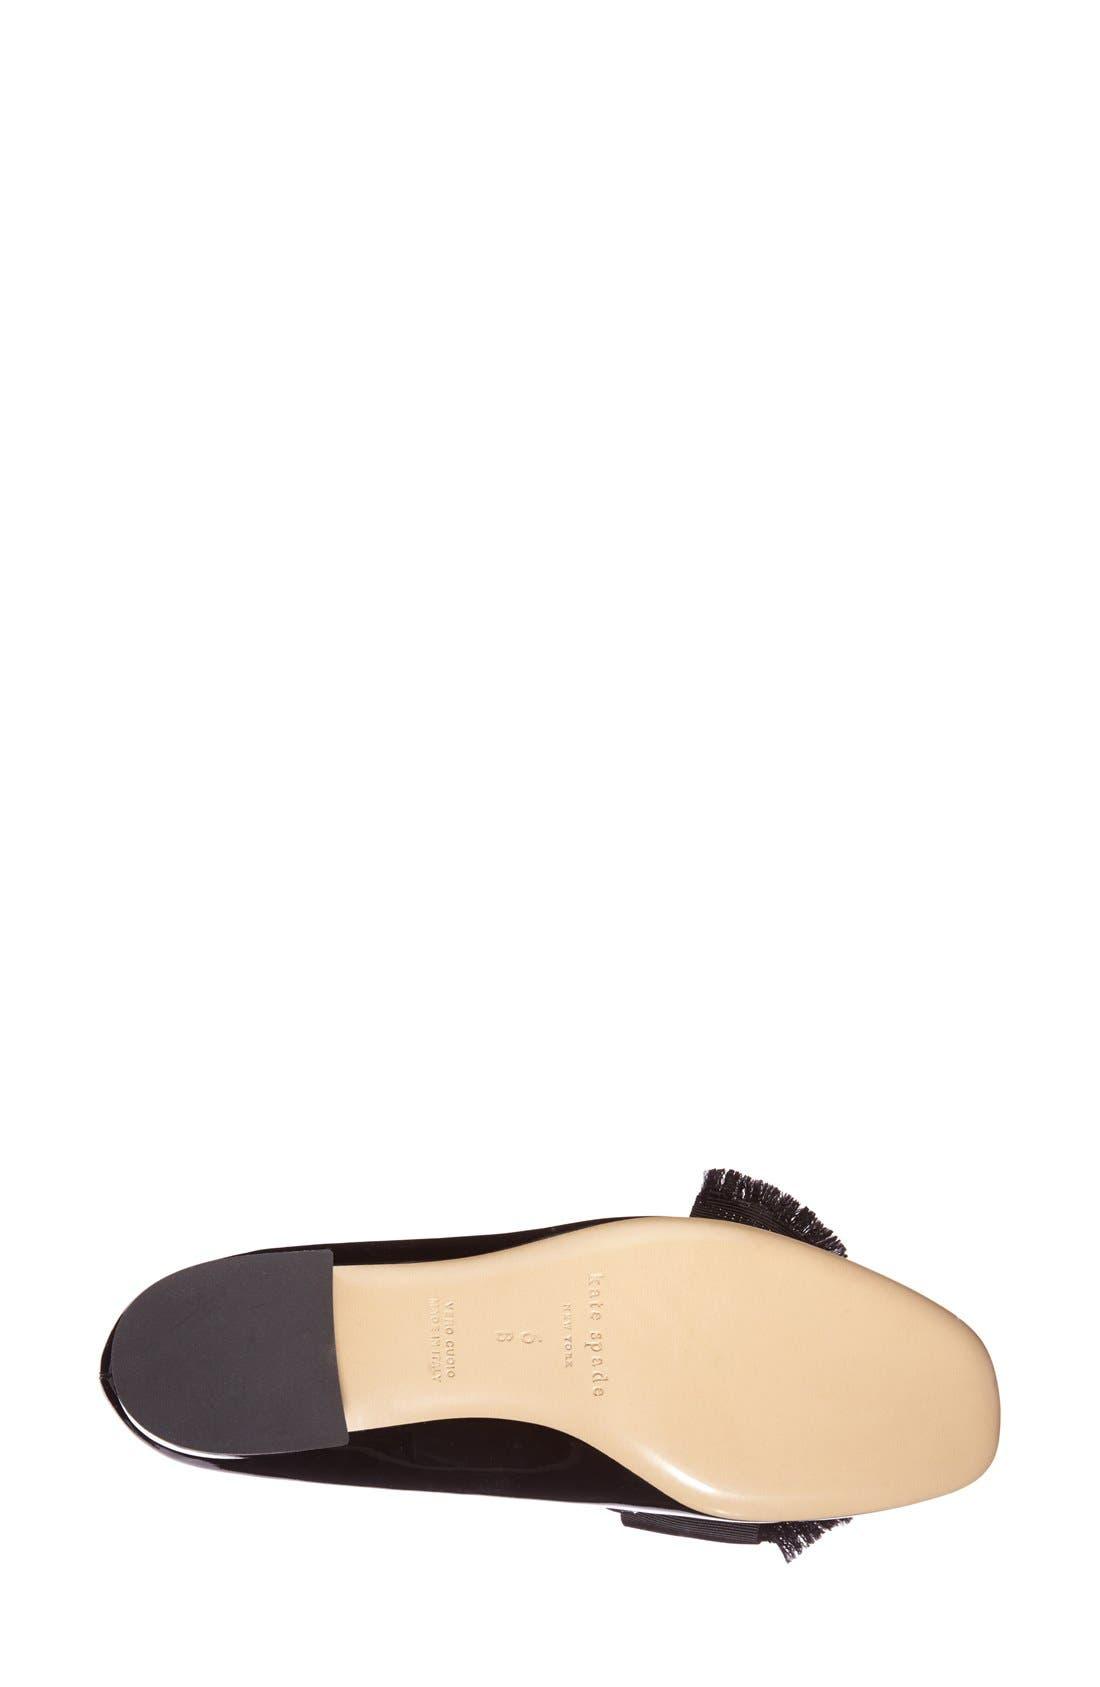 KATE SPADE NEW YORK,                             'gino' loafer,                             Alternate thumbnail 2, color,                             002